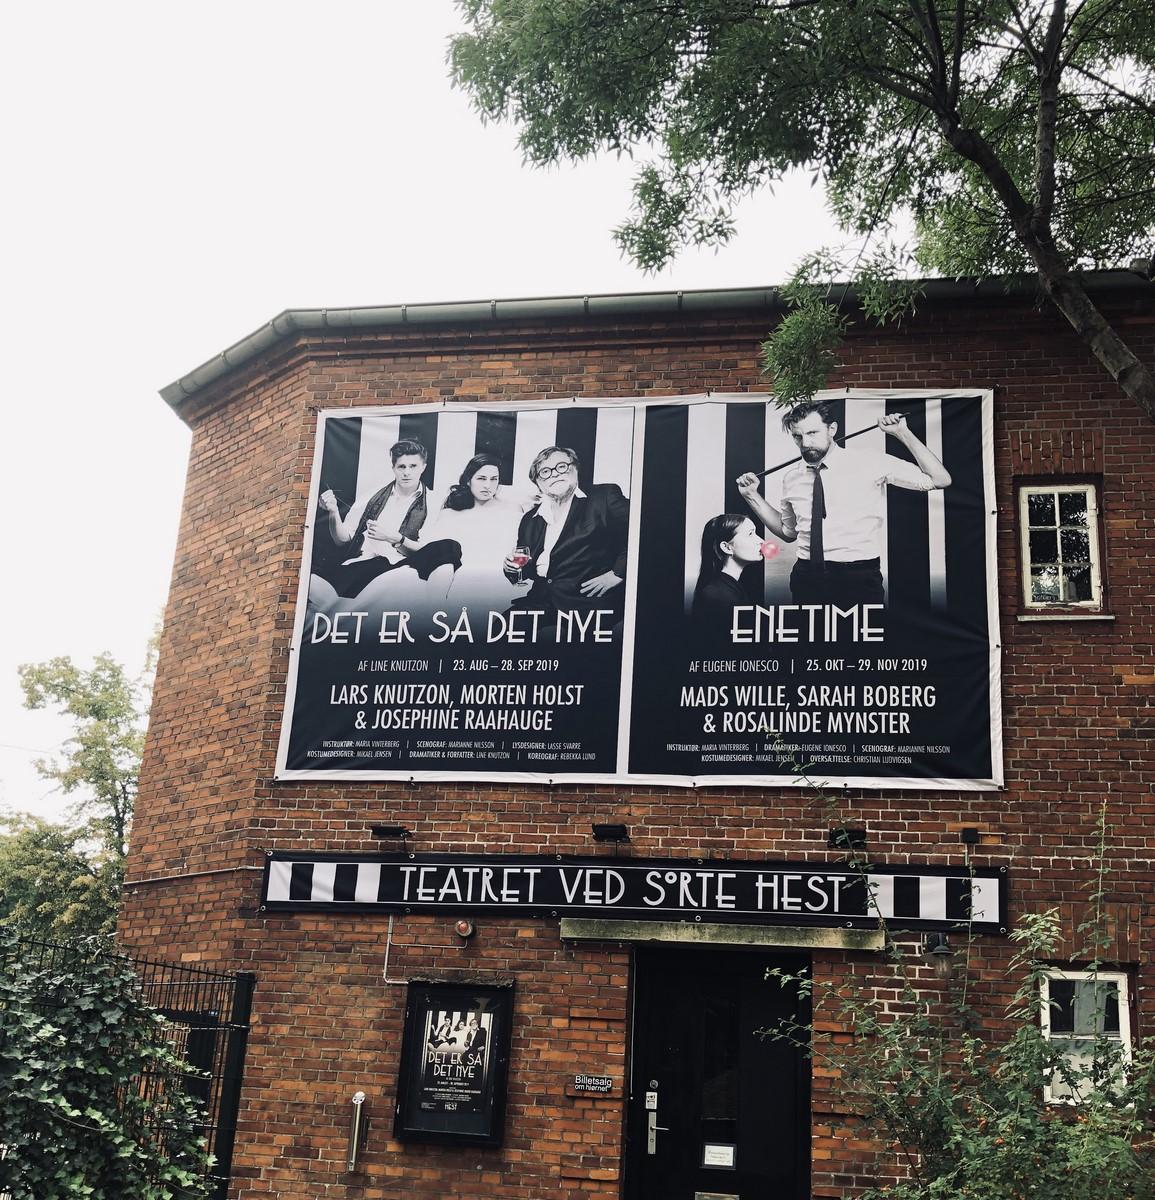 Spotlight: Teatret ved Sorte Hest